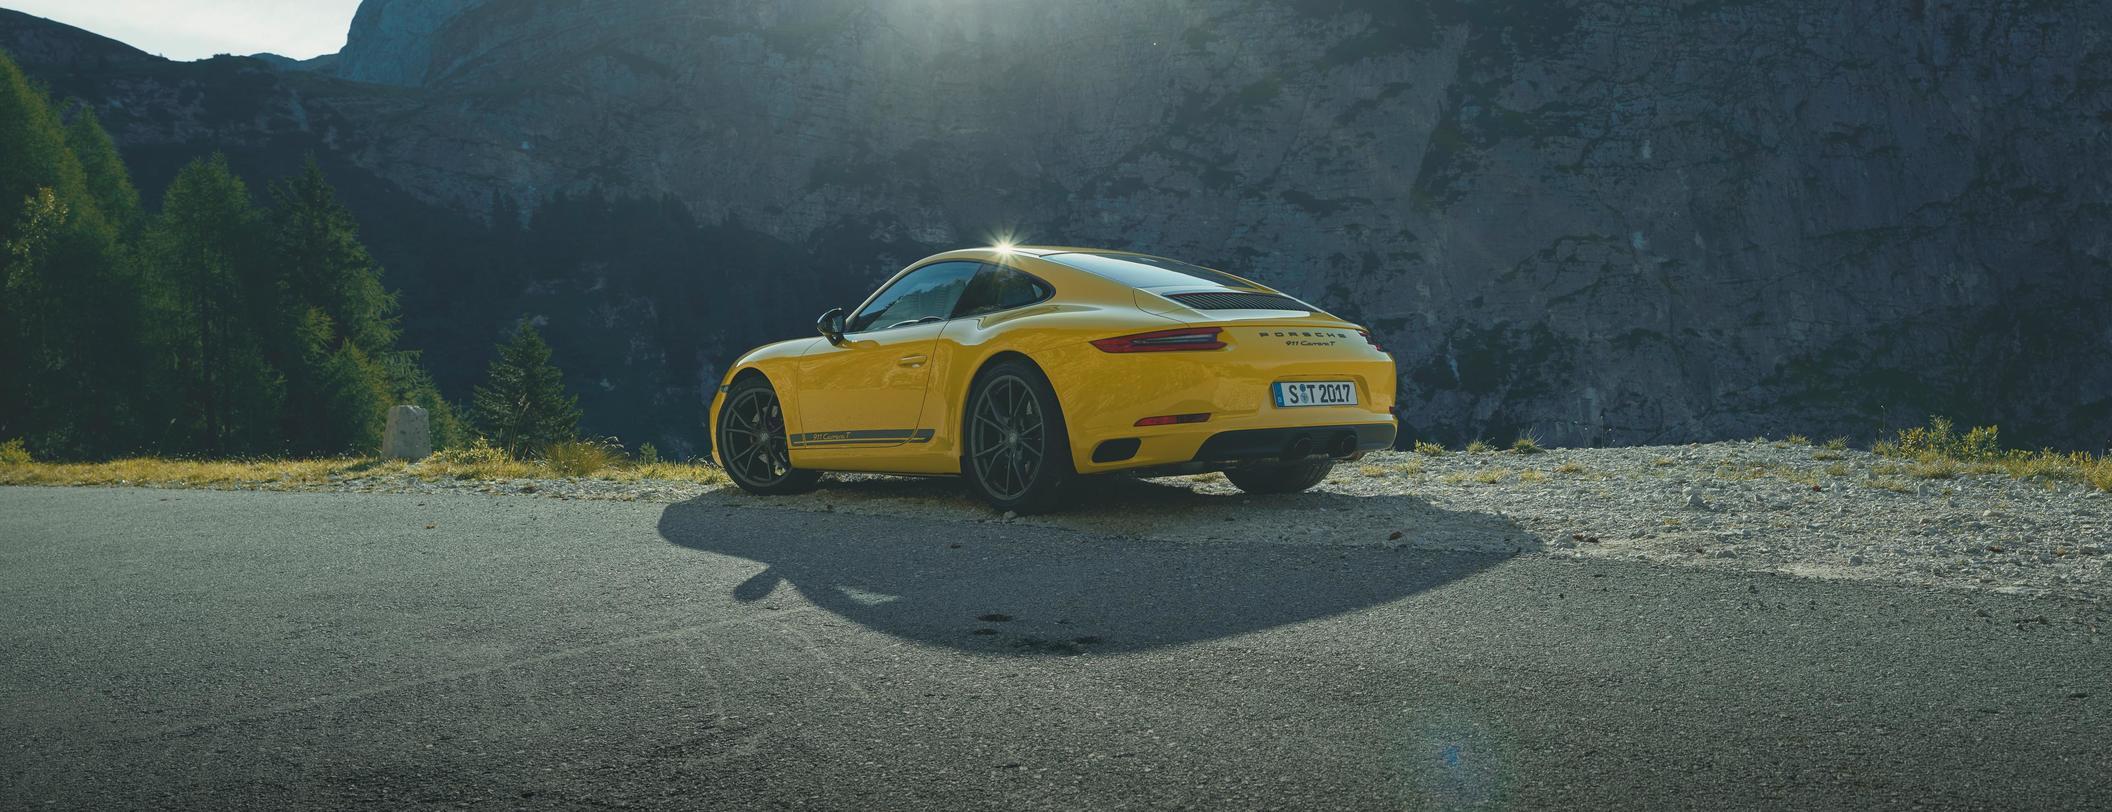 Porsche - 911 Carrera T